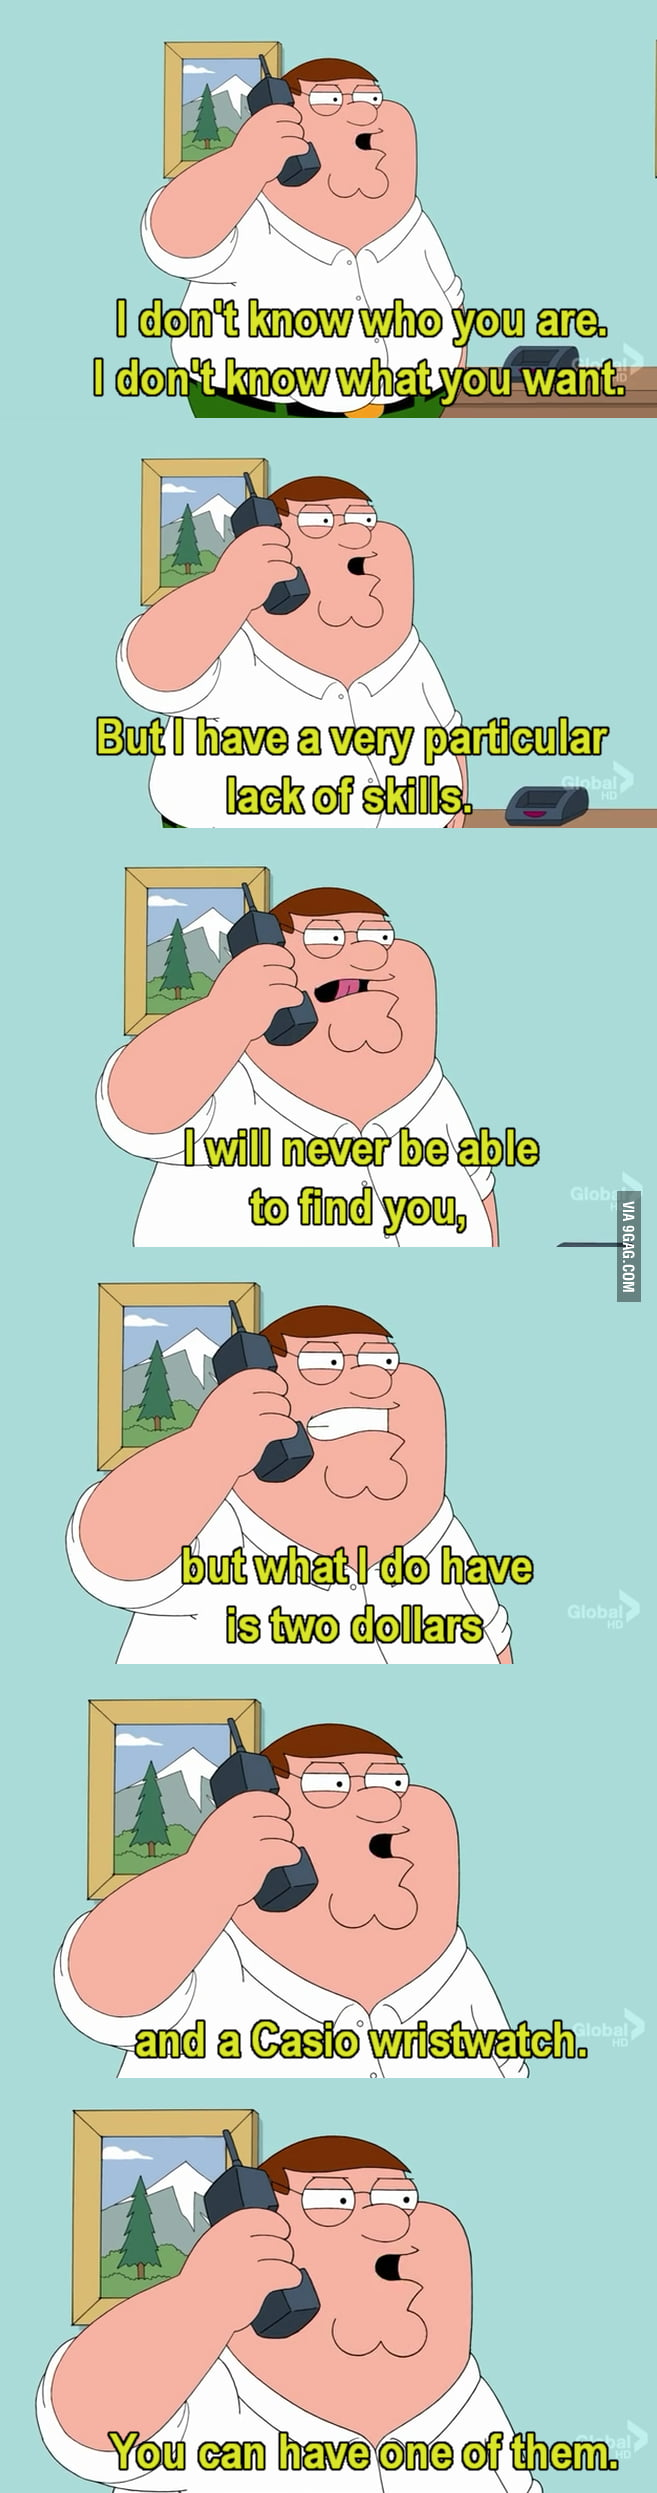 Lois, Meg's dead!